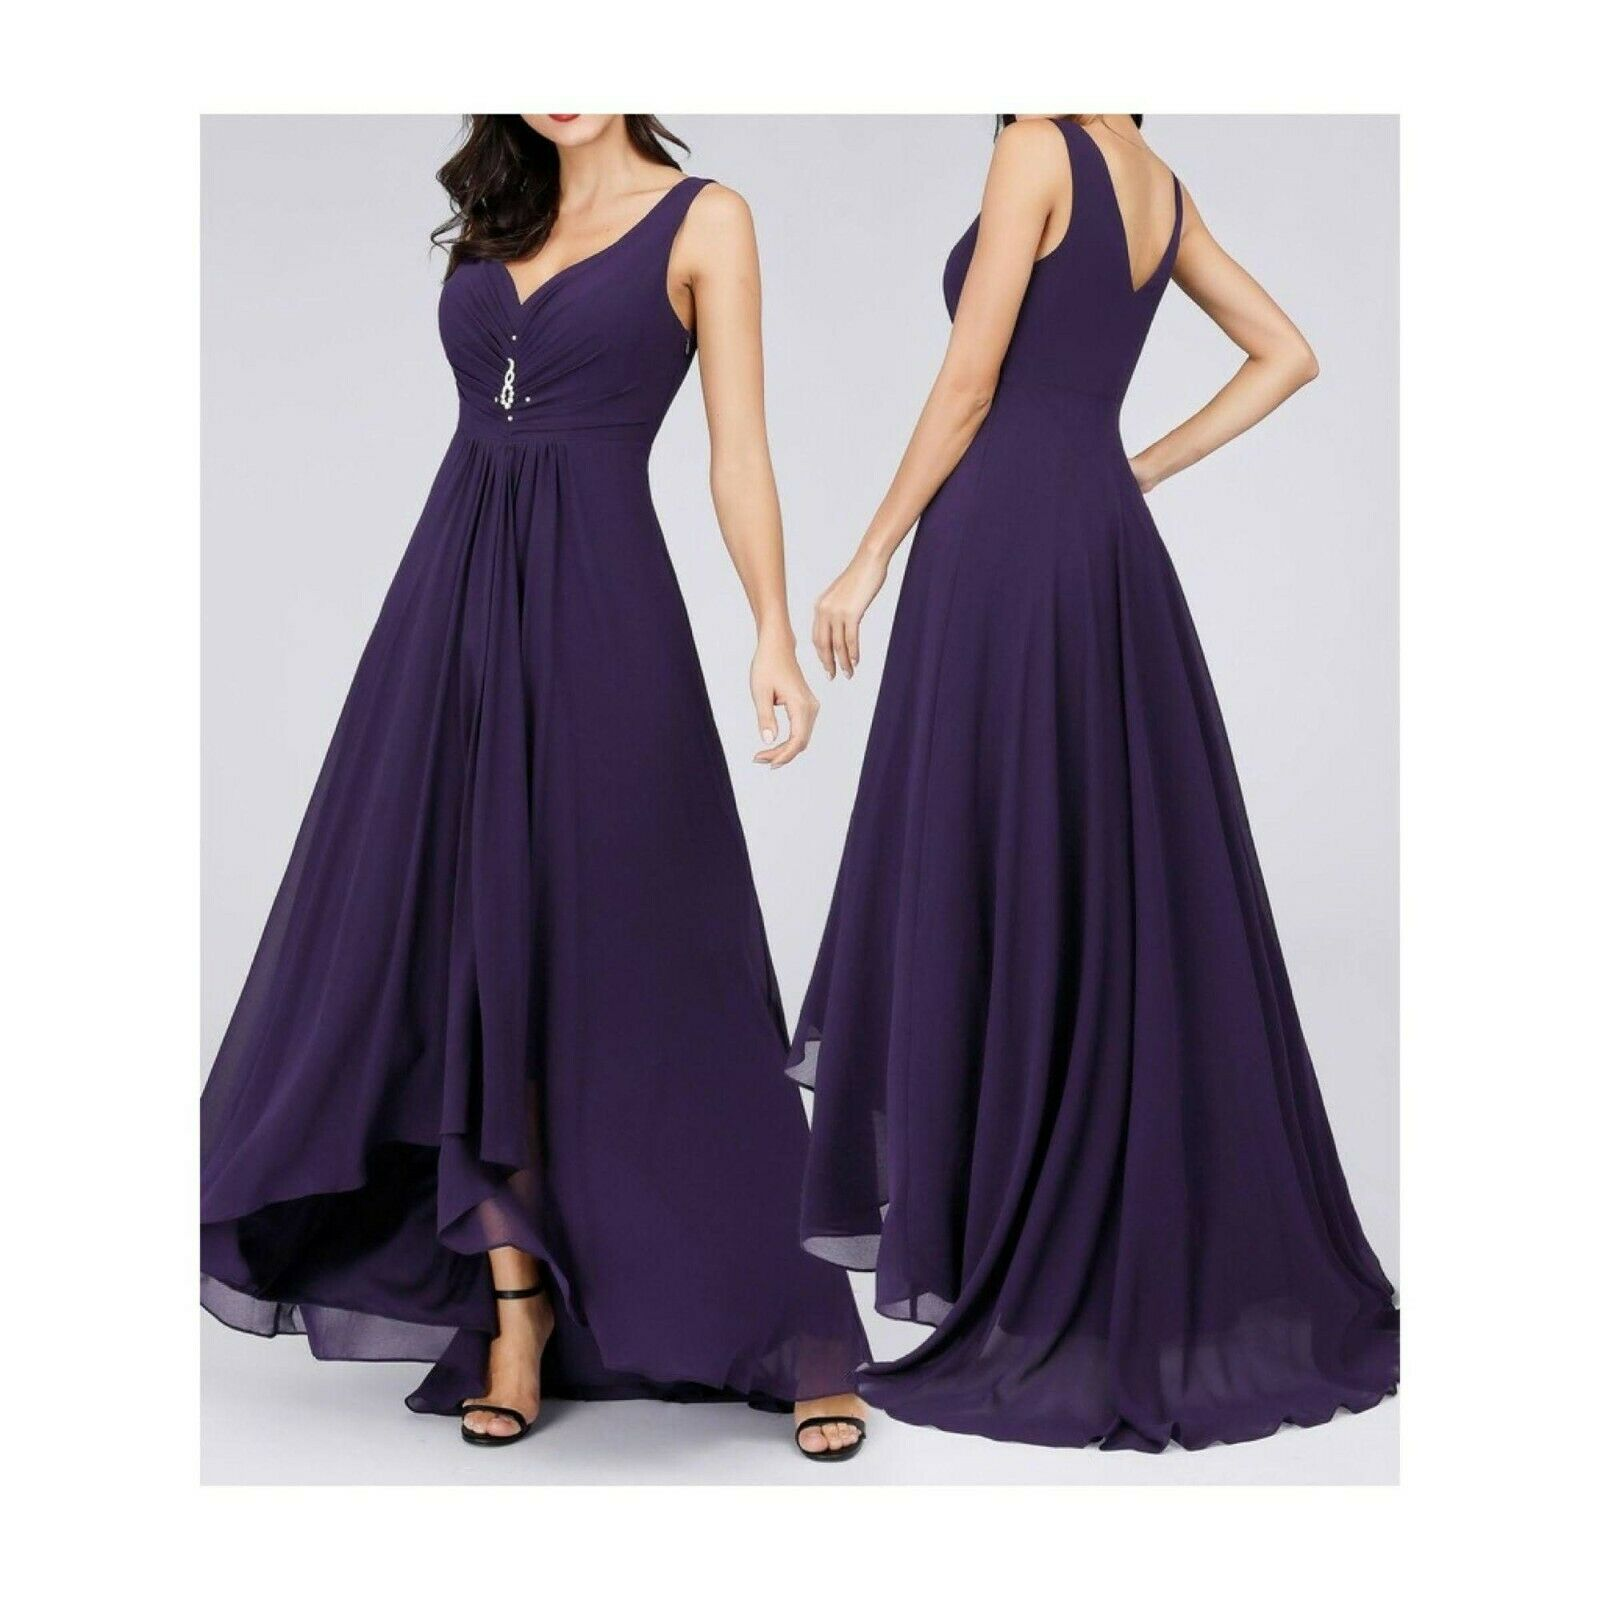 Ever-Pretty High Low Low Simple Chiffon Maternity Party Dress Sz 10 Dark Purple